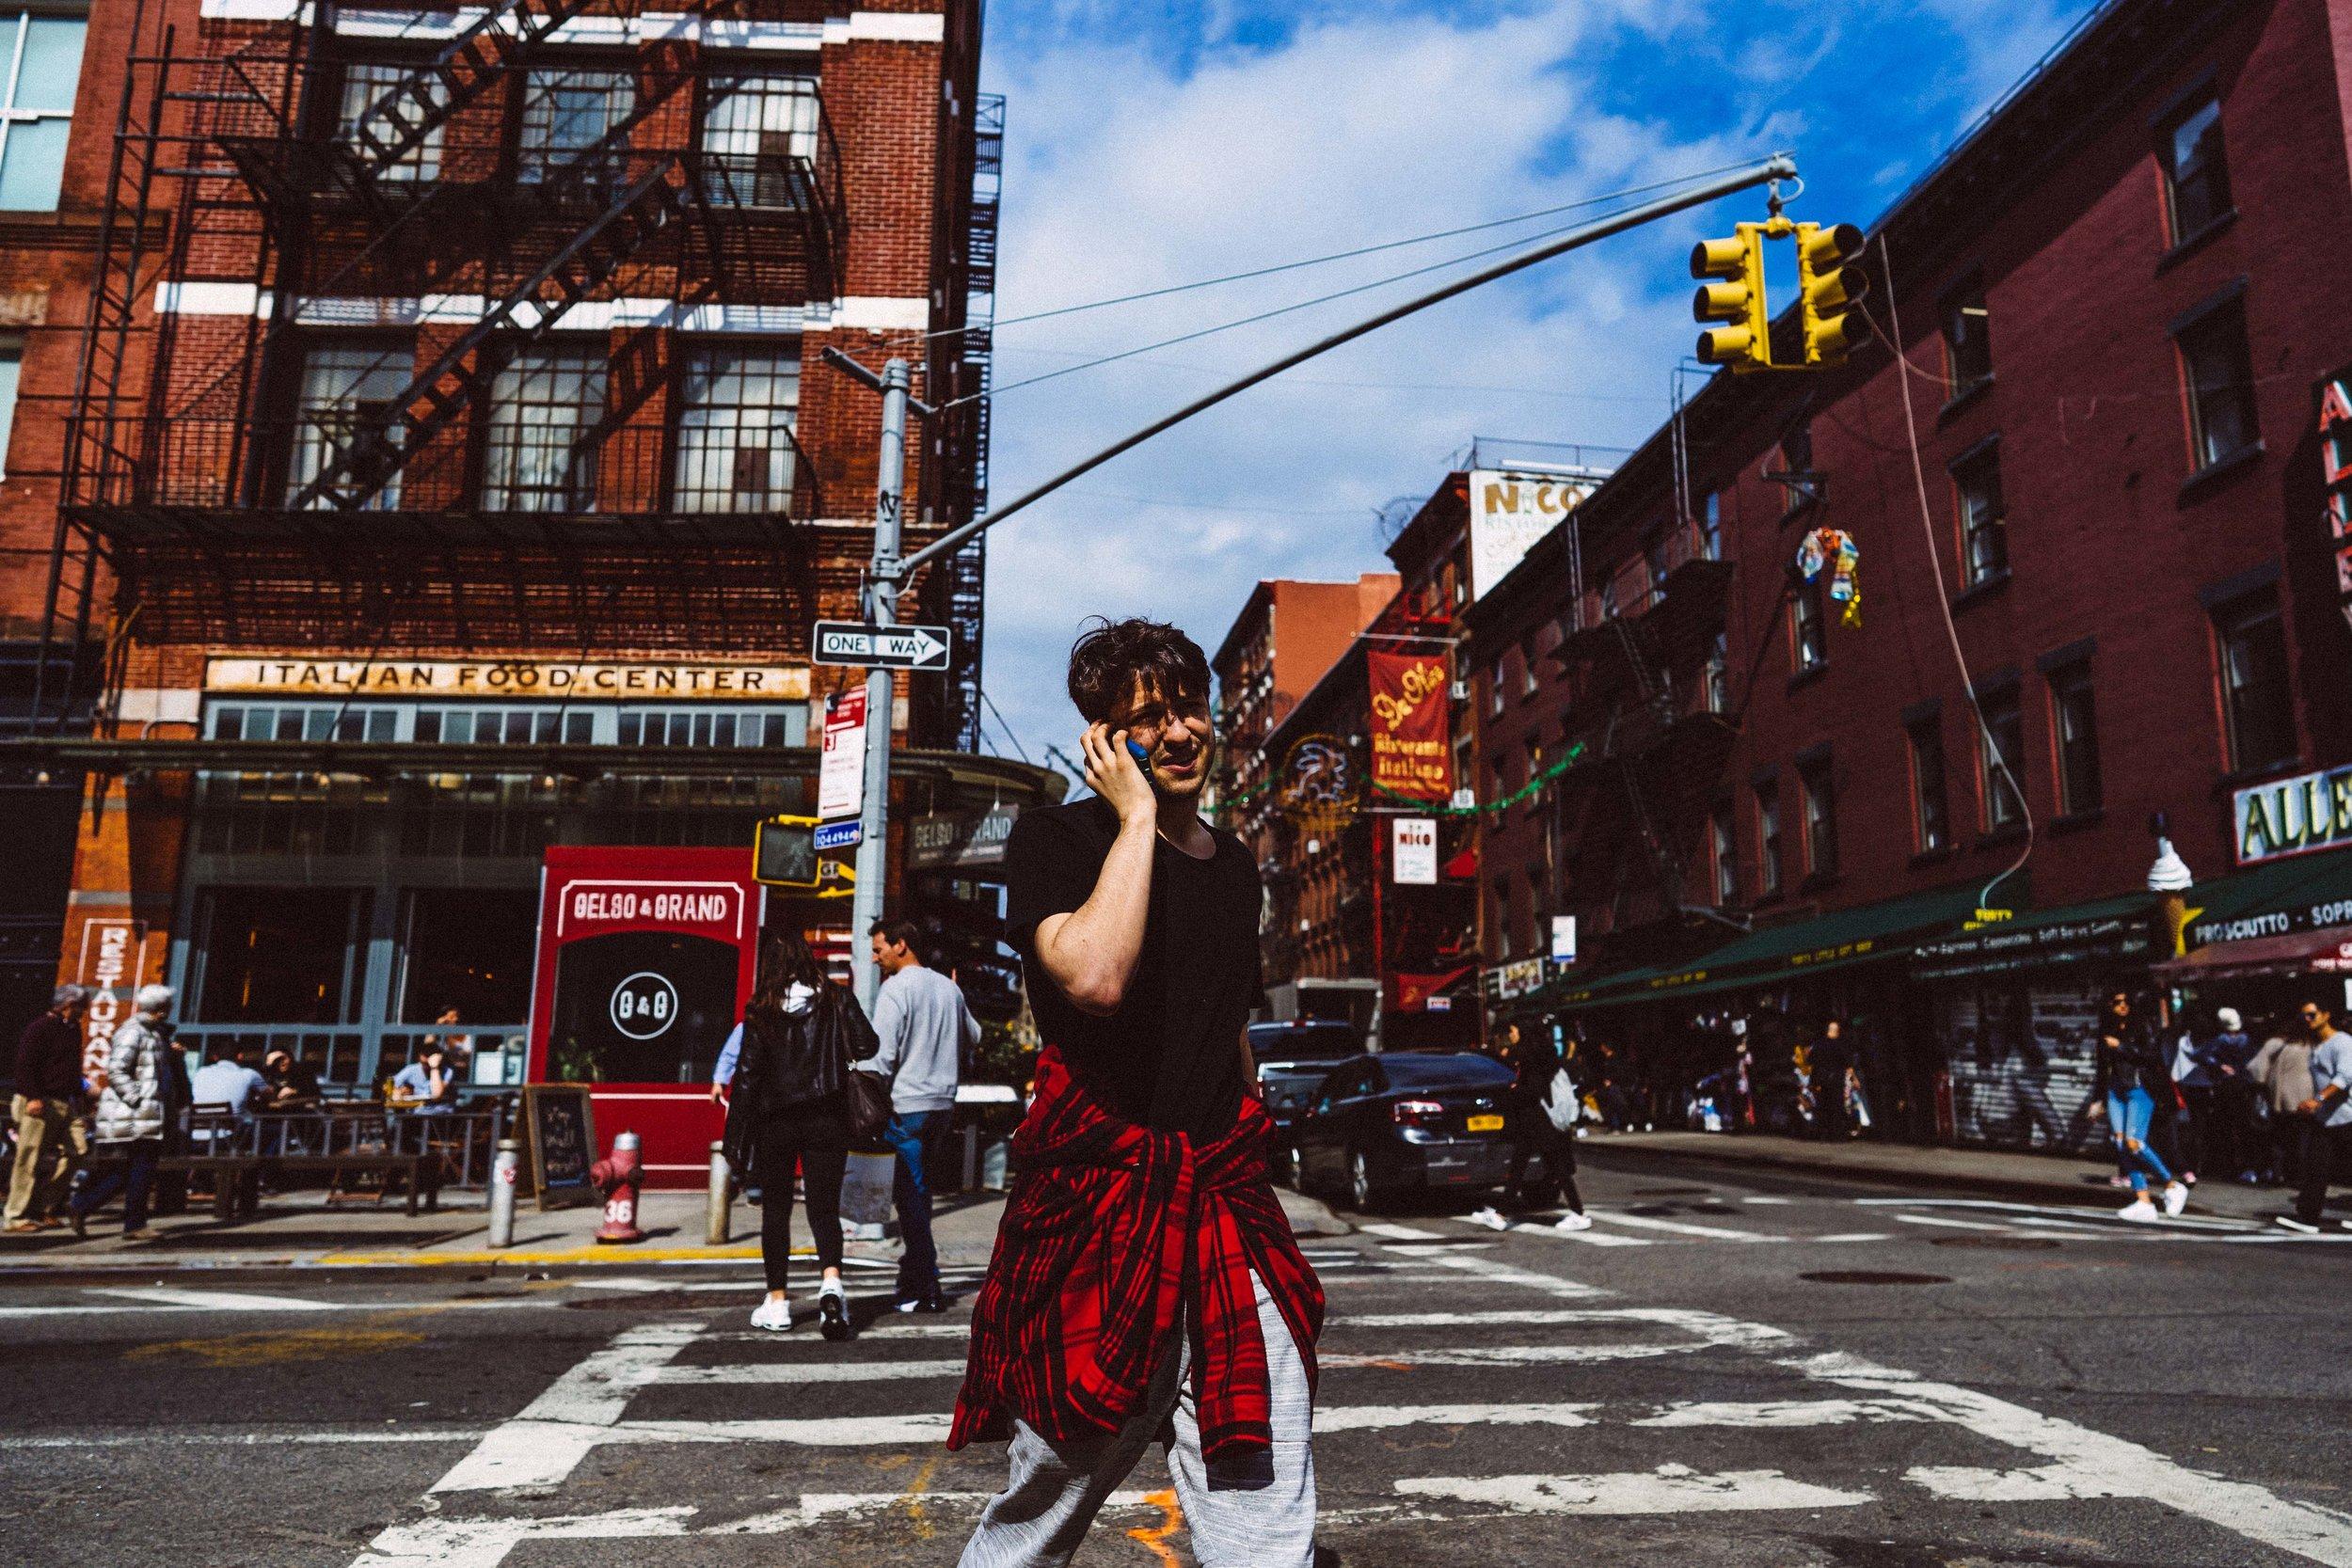 newyork-sony-102453.jpg